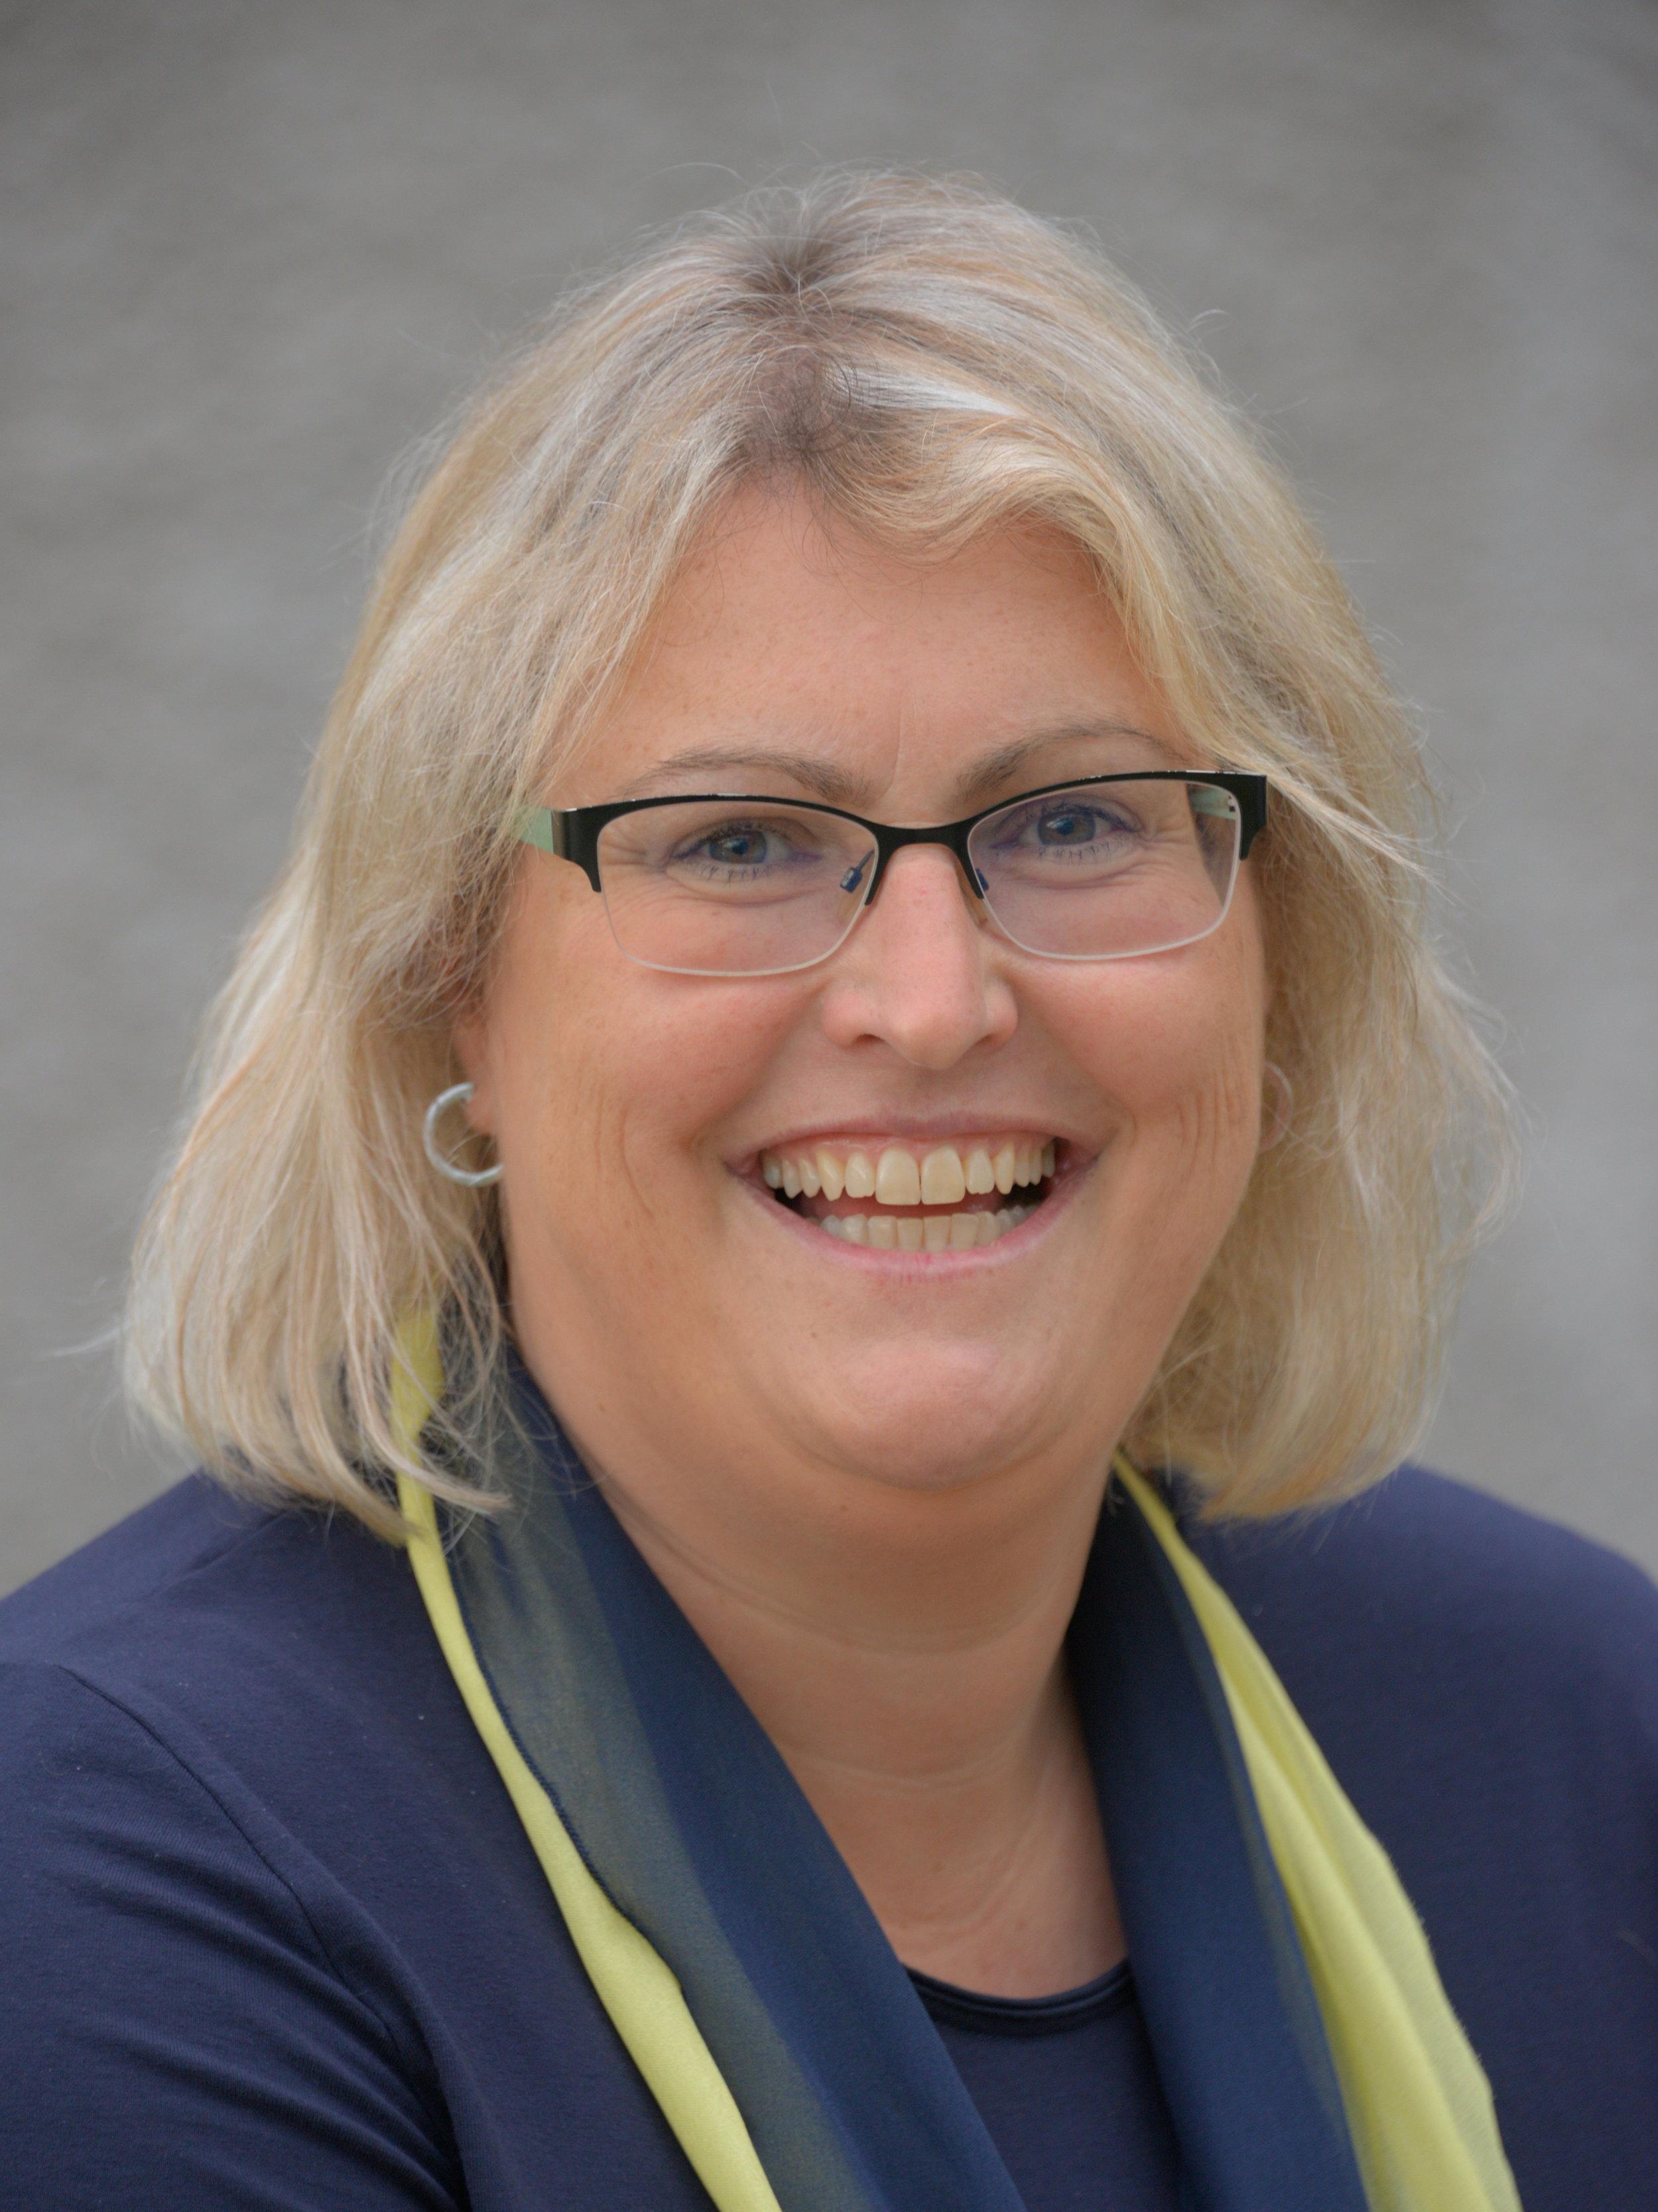 Sonja Lechner